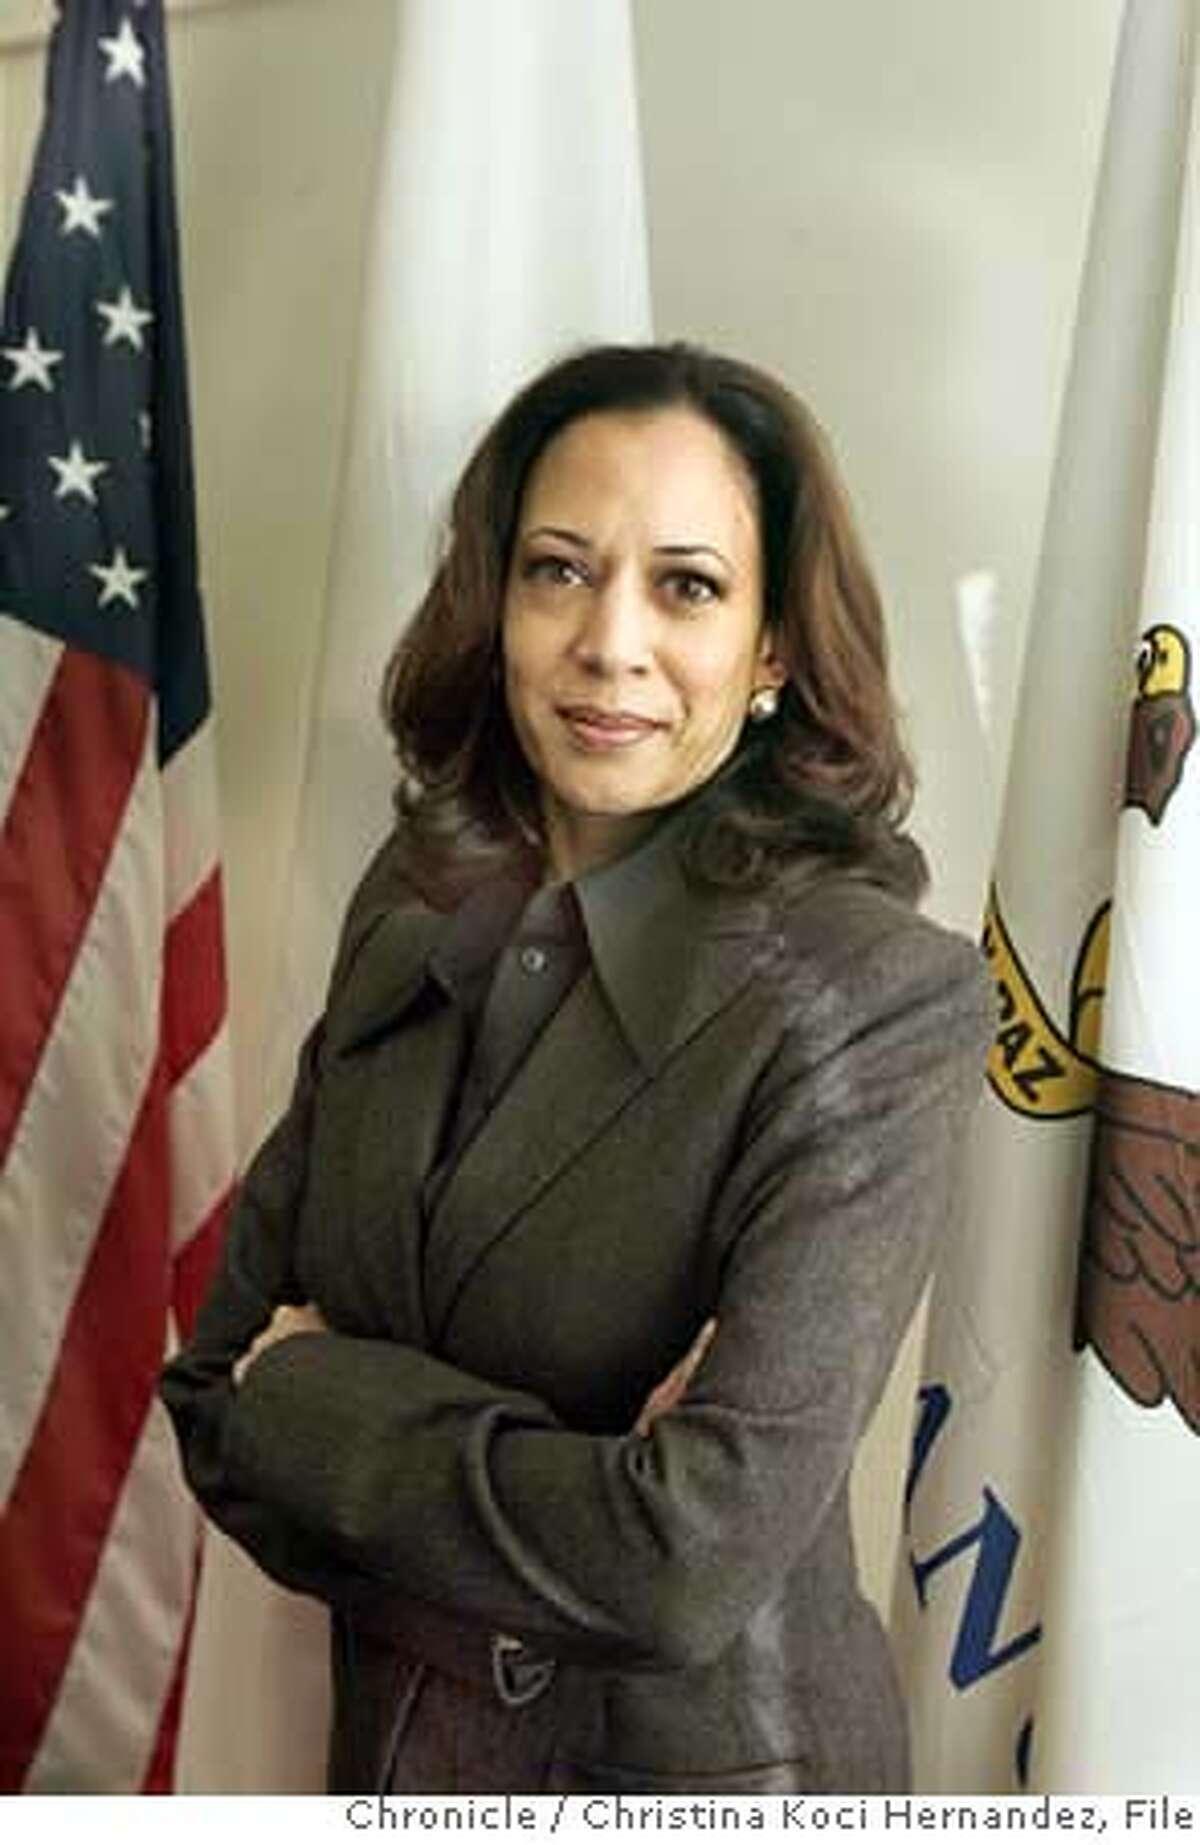 ###Live Caption:SF District Attorney Kamala Harris.###Caption History:CHRISTINA KOCI HERNANDEZ/CHRONICLE We're doing a two year anniversary story on SF District Attorney Kamala Harris. Ran on: 08-16-2007 Kamala Harris was elected D.A. in 2003. Ran on: 08-16-2007 ALSO Ran on: 08-31-2007 (A1) S.F. Mayor Gavin Newsom Ran on: 08-31-2007 ALSO Ran on: 10-28-2007 Gavin Newsom ALSO Ran on: 11-07-2007 Gavin Newsom ALSO Ran on: 01-09-2008 Gavin Newsom Ran on: 01-09-2008 Ran on: 01-09-2008 Ran on: 01-09-2008 Ran on: 04-05-2008 District Attorney Kamala Harris hasnt spoken publicly about the controversial grants. Ran on: 04-05-2008 District Attorney Kamala Harris hasnt spoken publicly about the controversial grants.###Notes:###Special Instructions: